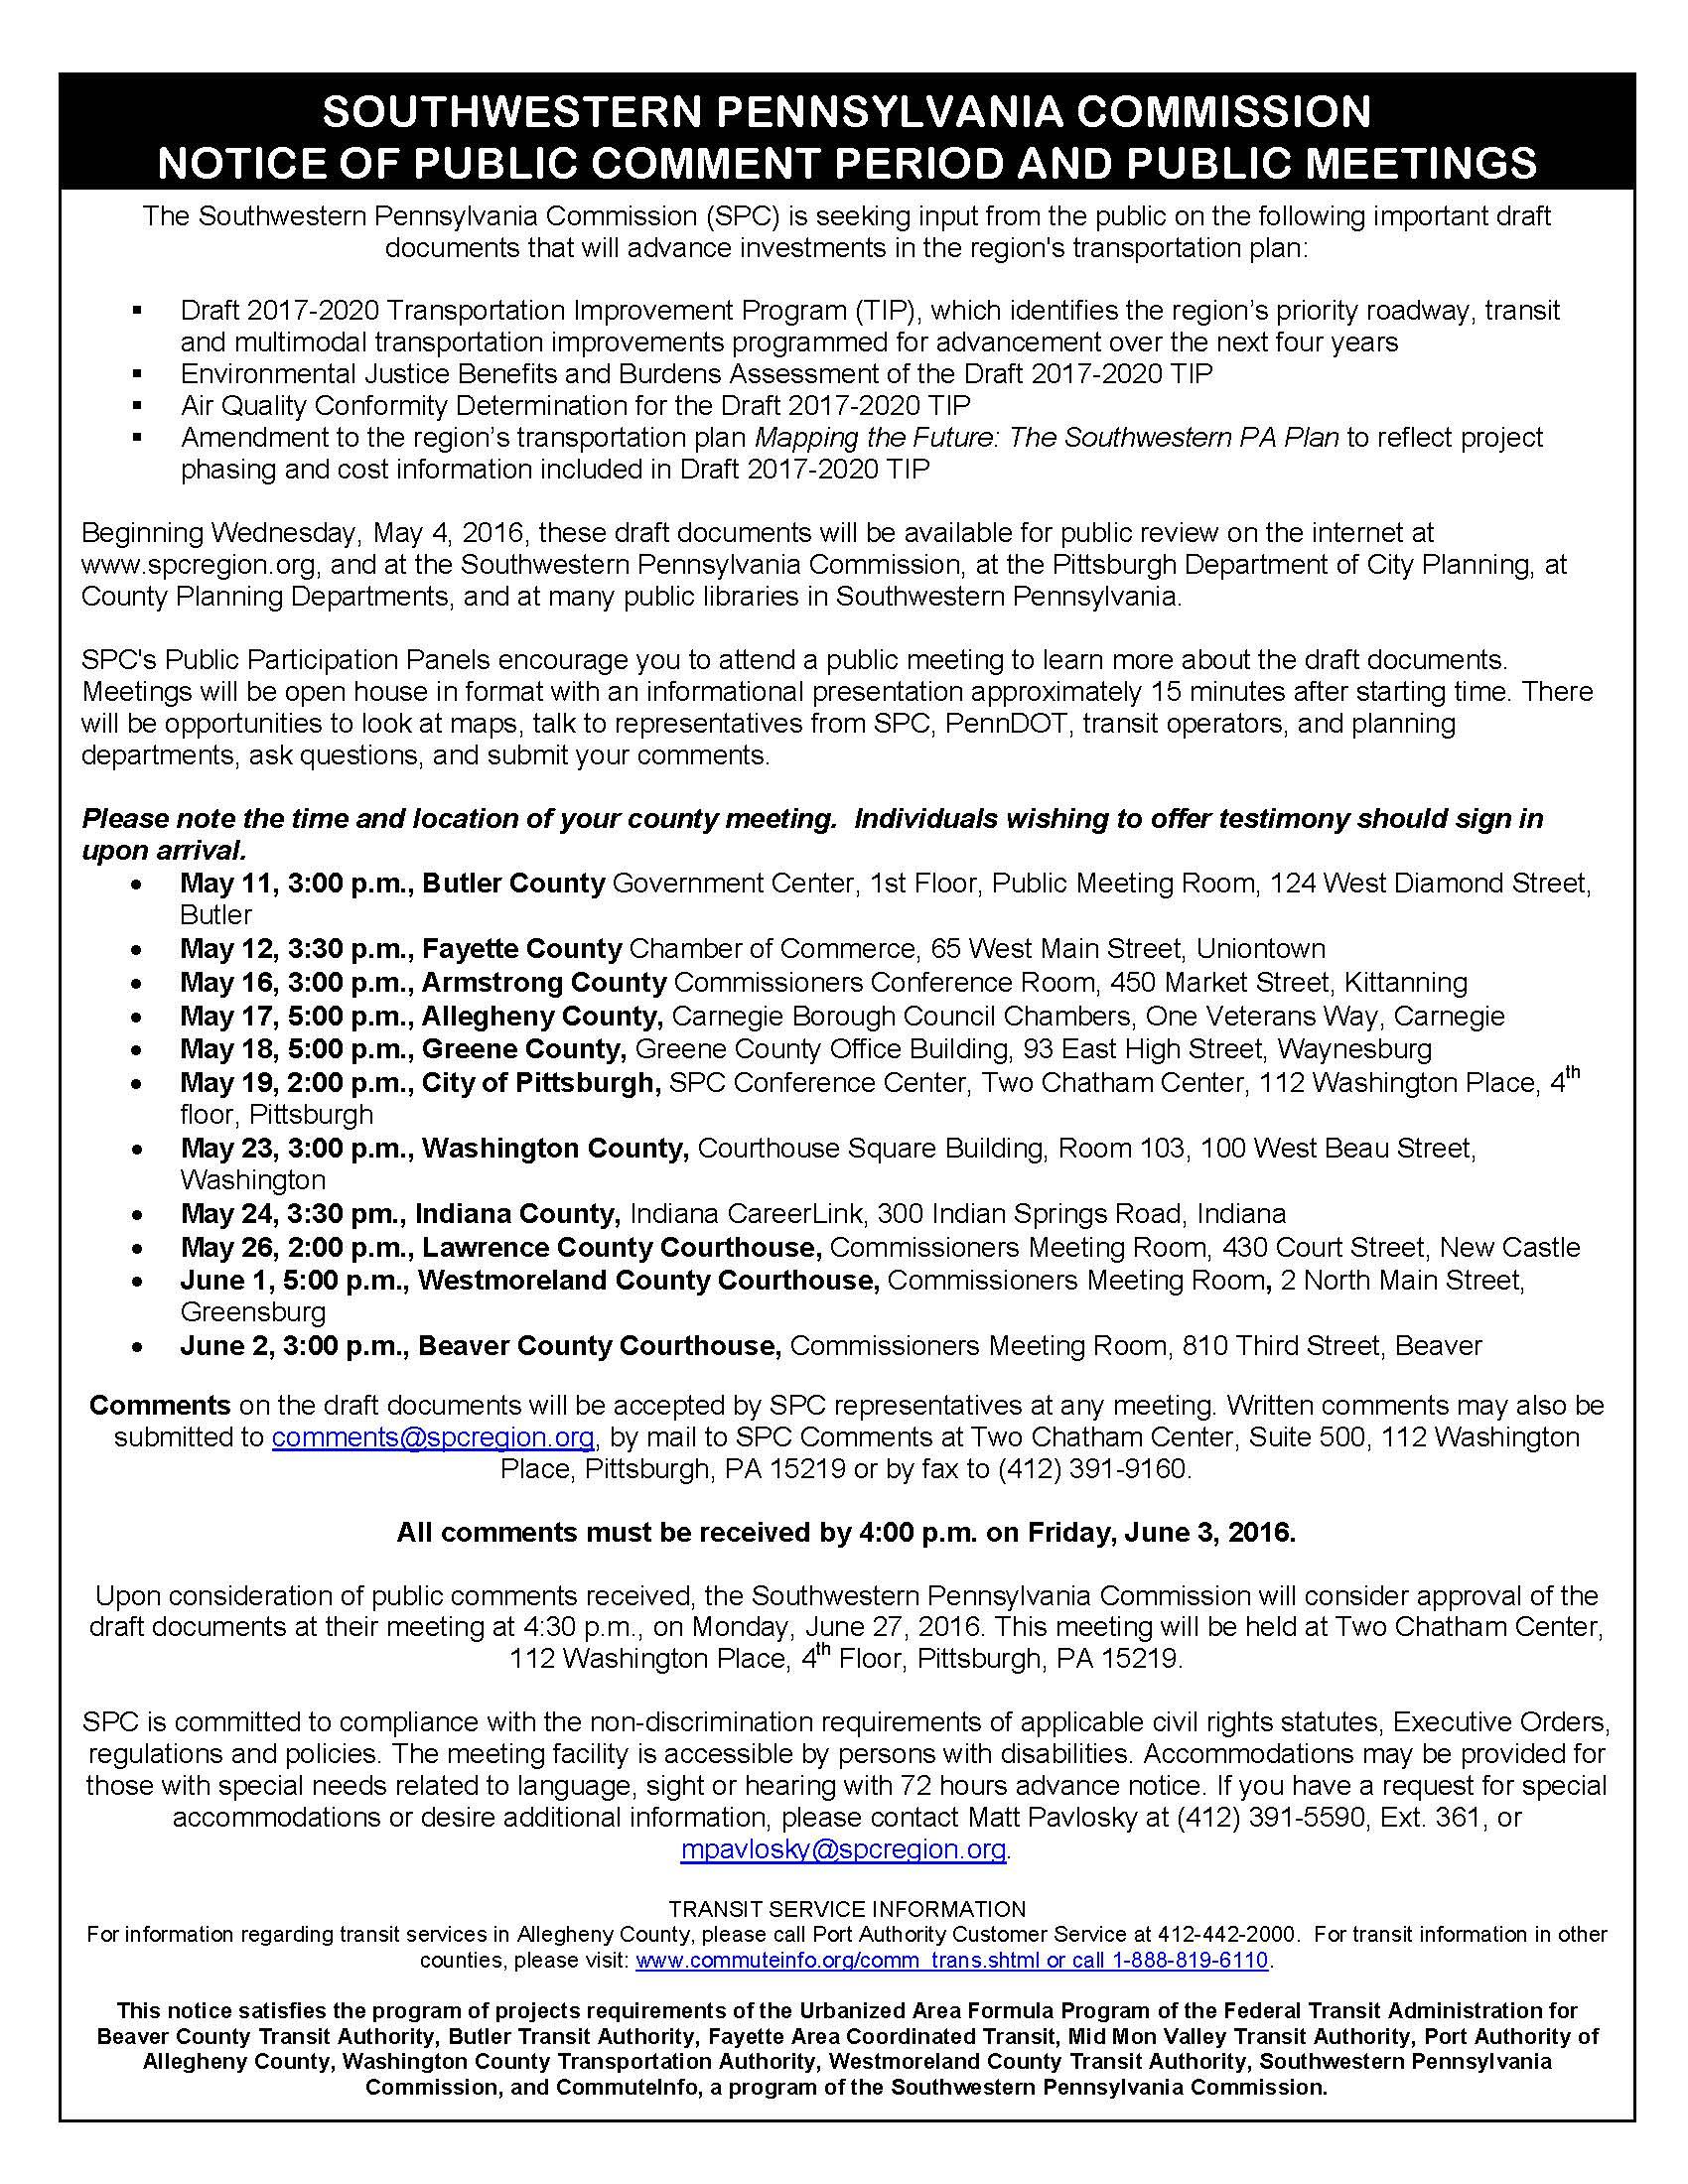 Southwestern Pennsylvania Commission Public Meeting-Allegheny County - 35b9df899